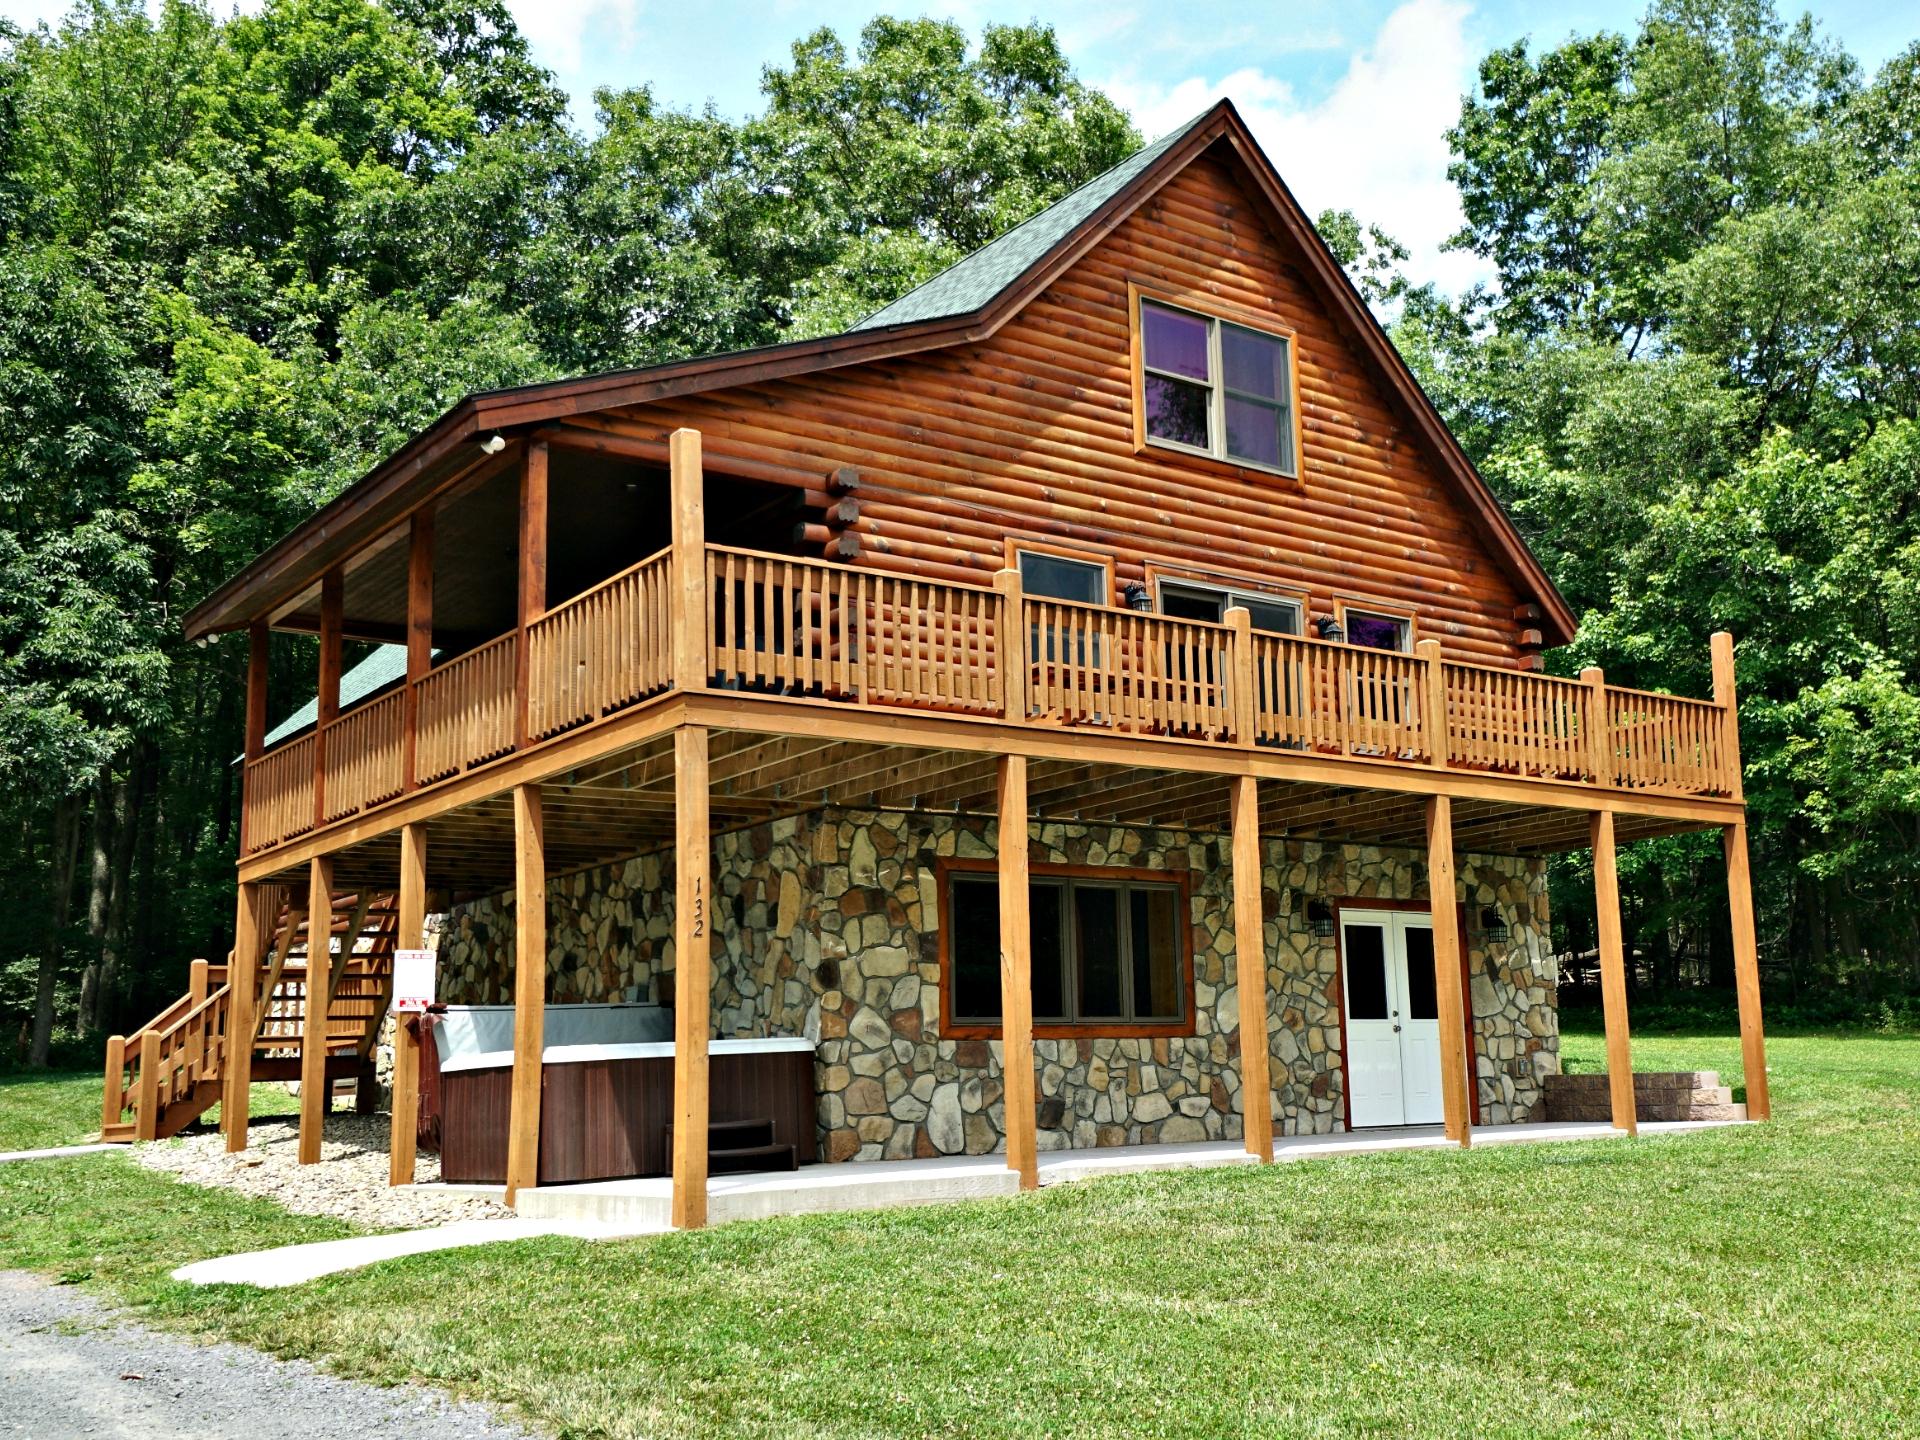 rent uinta summer lc sq log utah majestic cabins properties rentals for mount home vacation ext ski rental